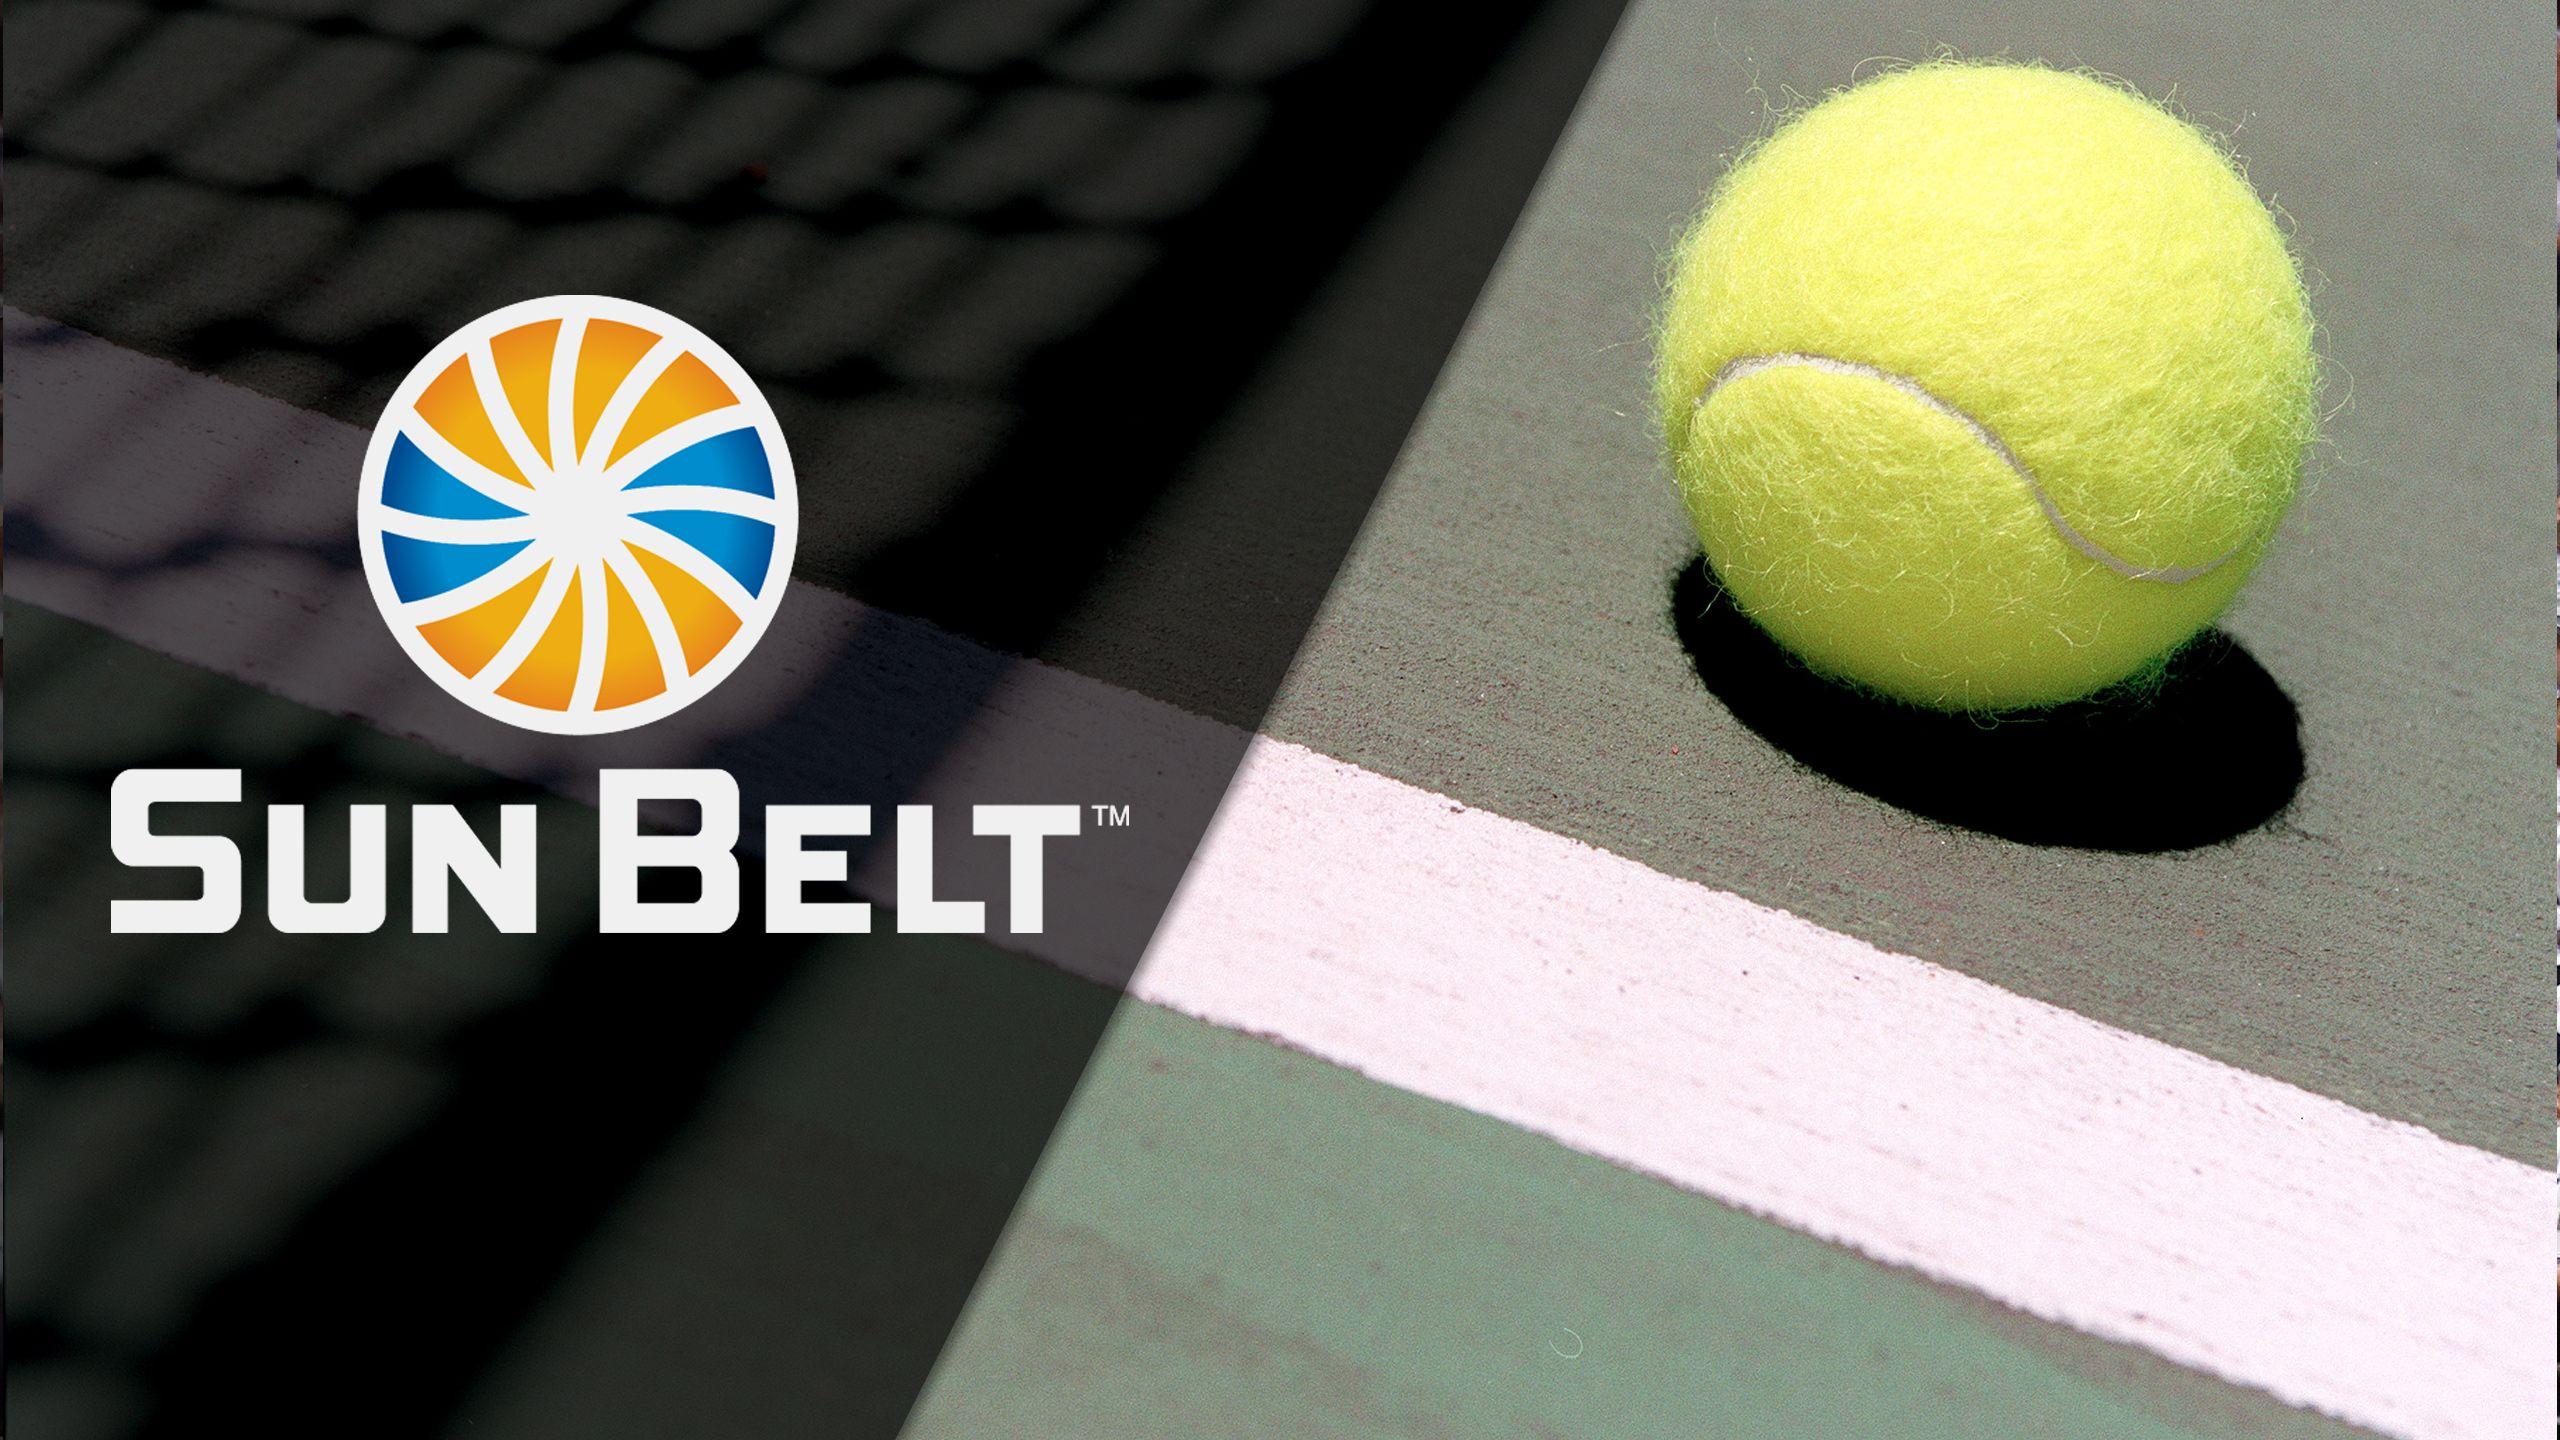 2017 Sun Belt Men's Tennis Championship (Semifinals) (Sun Belt Men's Tennis Championship)